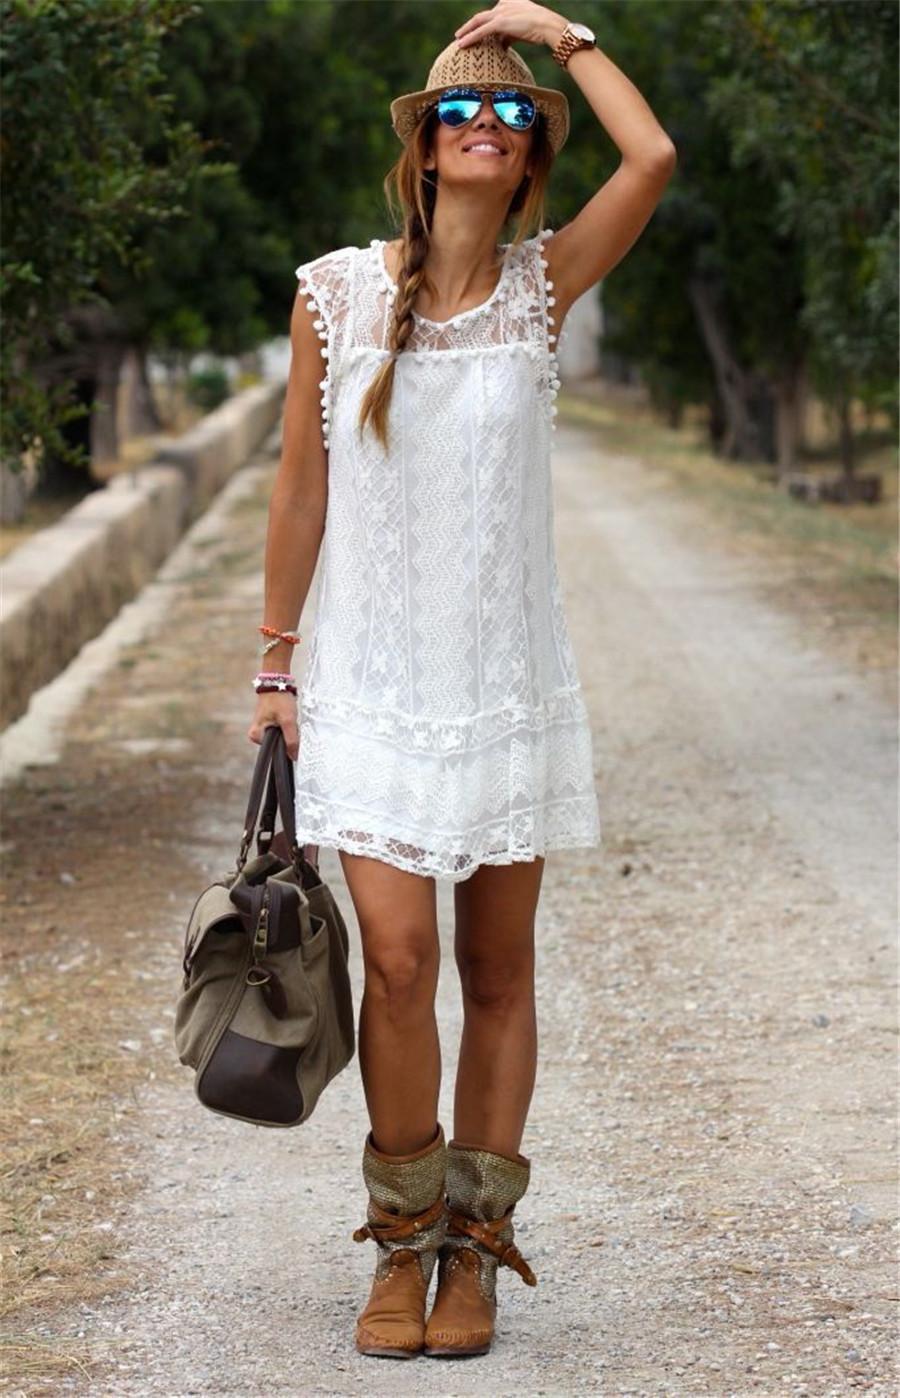 White Lace Sleeveless O-Neck Sexy Hollow Out Mini Dress 1